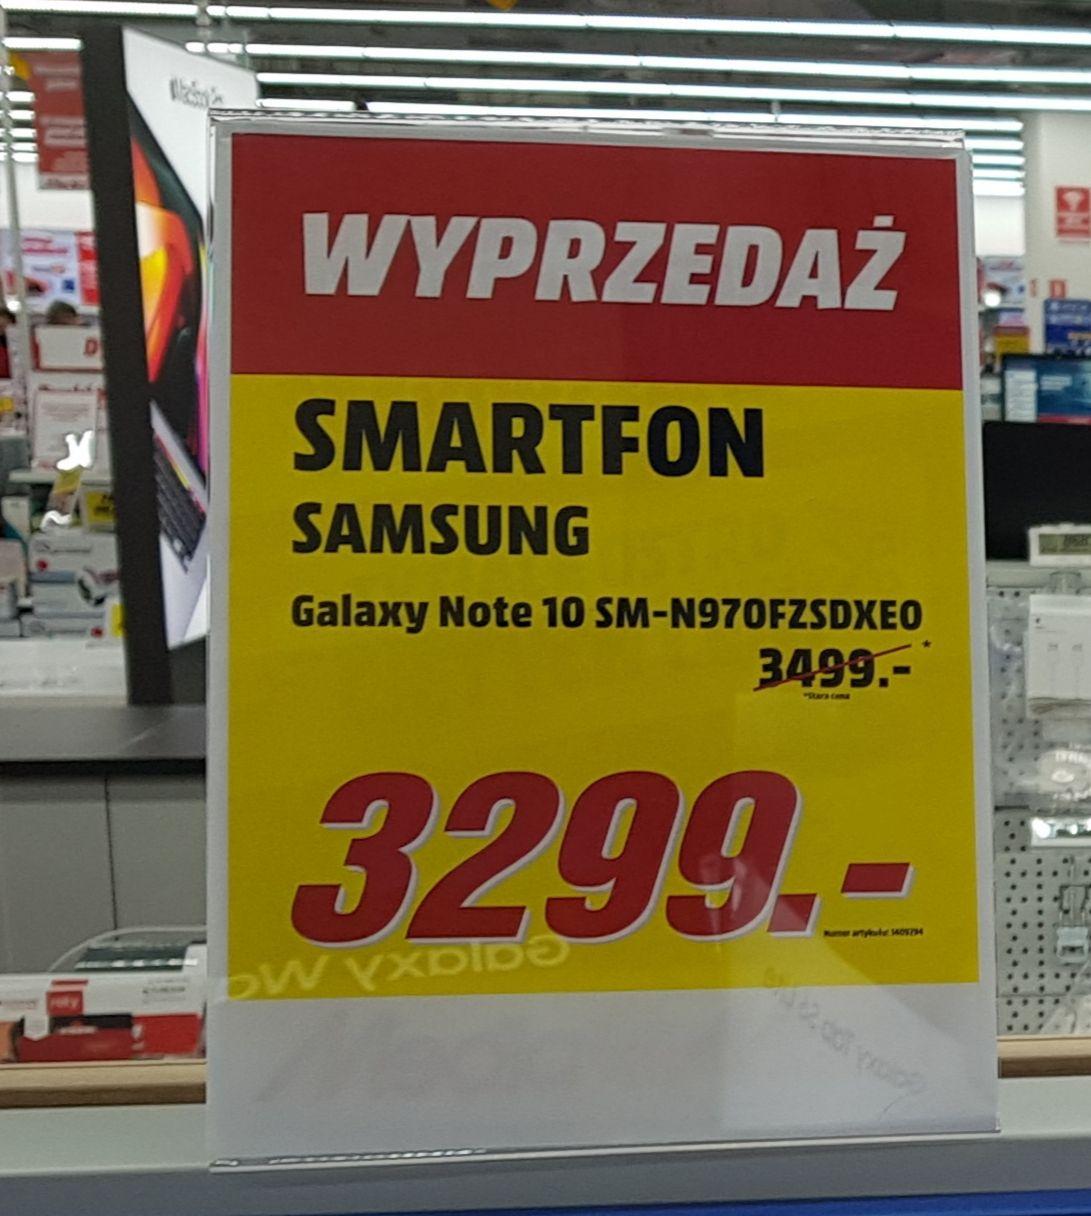 Smartfon Samsung Galaxy Note 10, Samsung Galaxy S10+ 3099zł